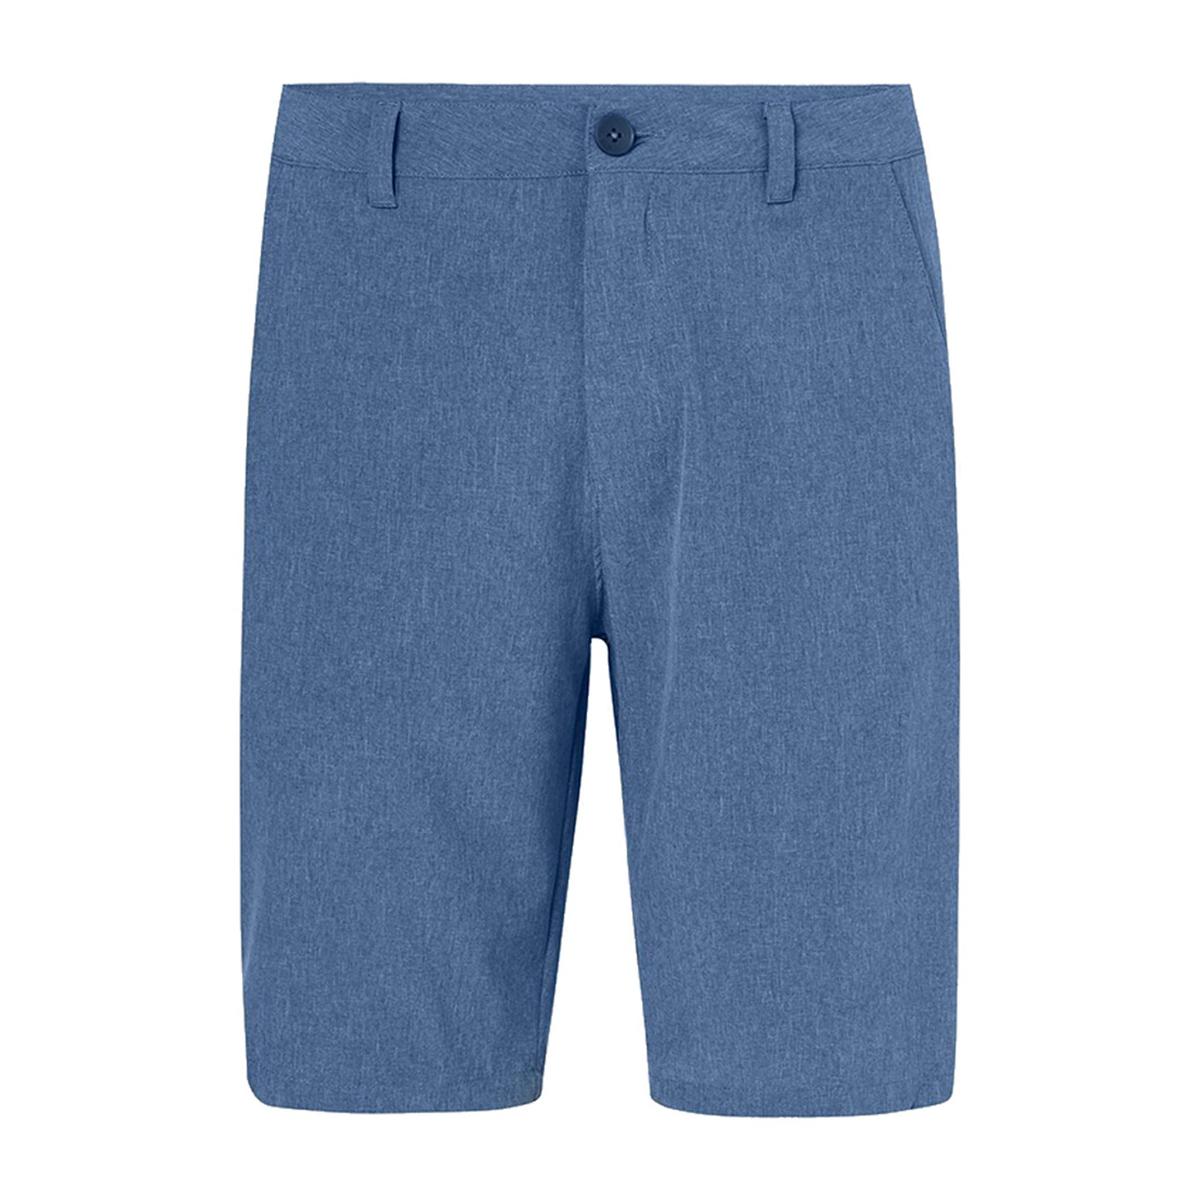 Men's Take Pro Short 2.0, Blue, swatch